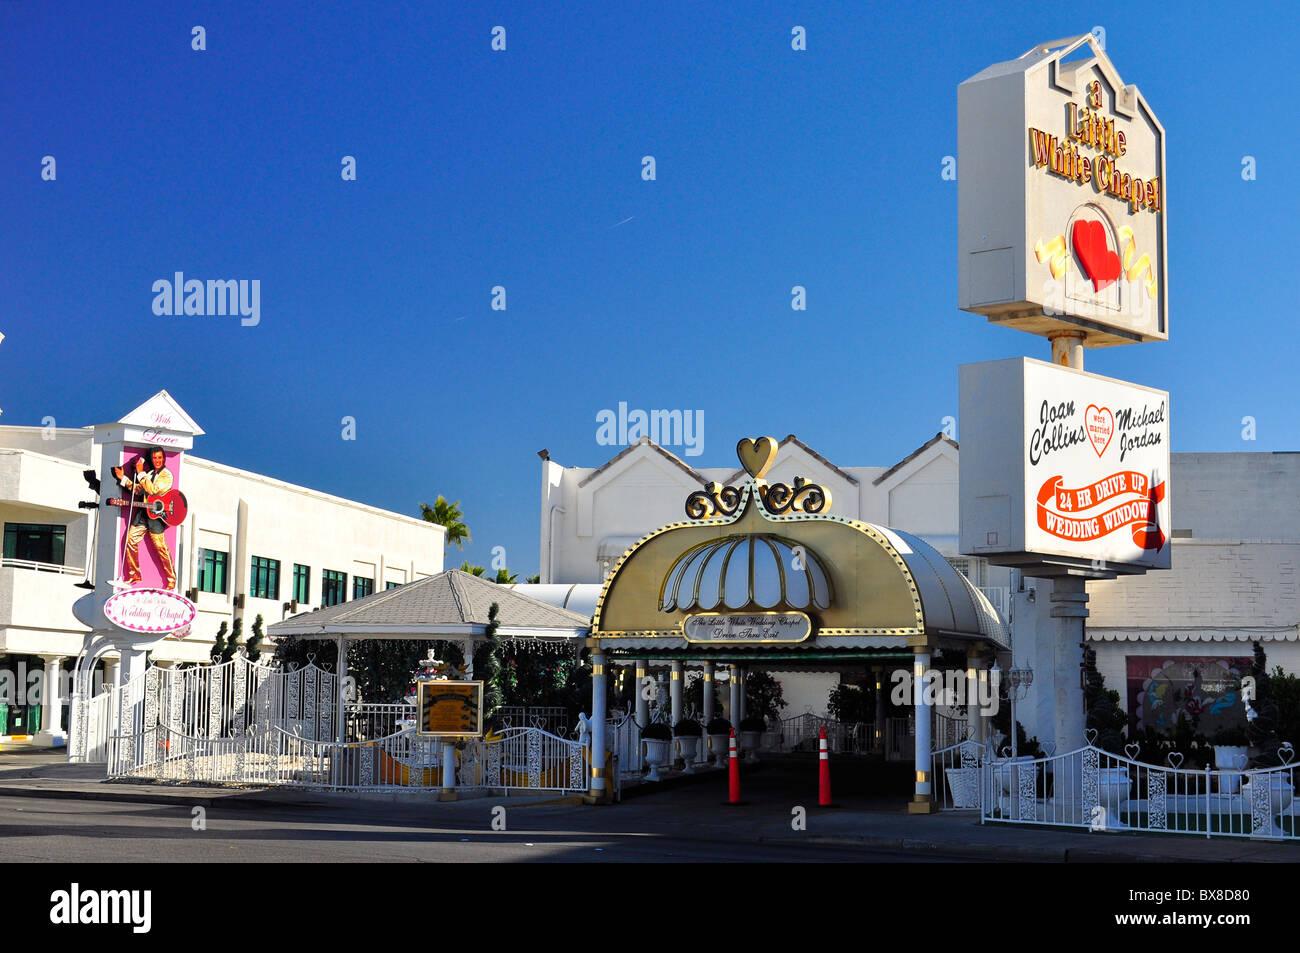 Drive Through Wedding Chapel   Drive Through Wedding Chapel In Las Vegas Nevada Usa Stock Photo